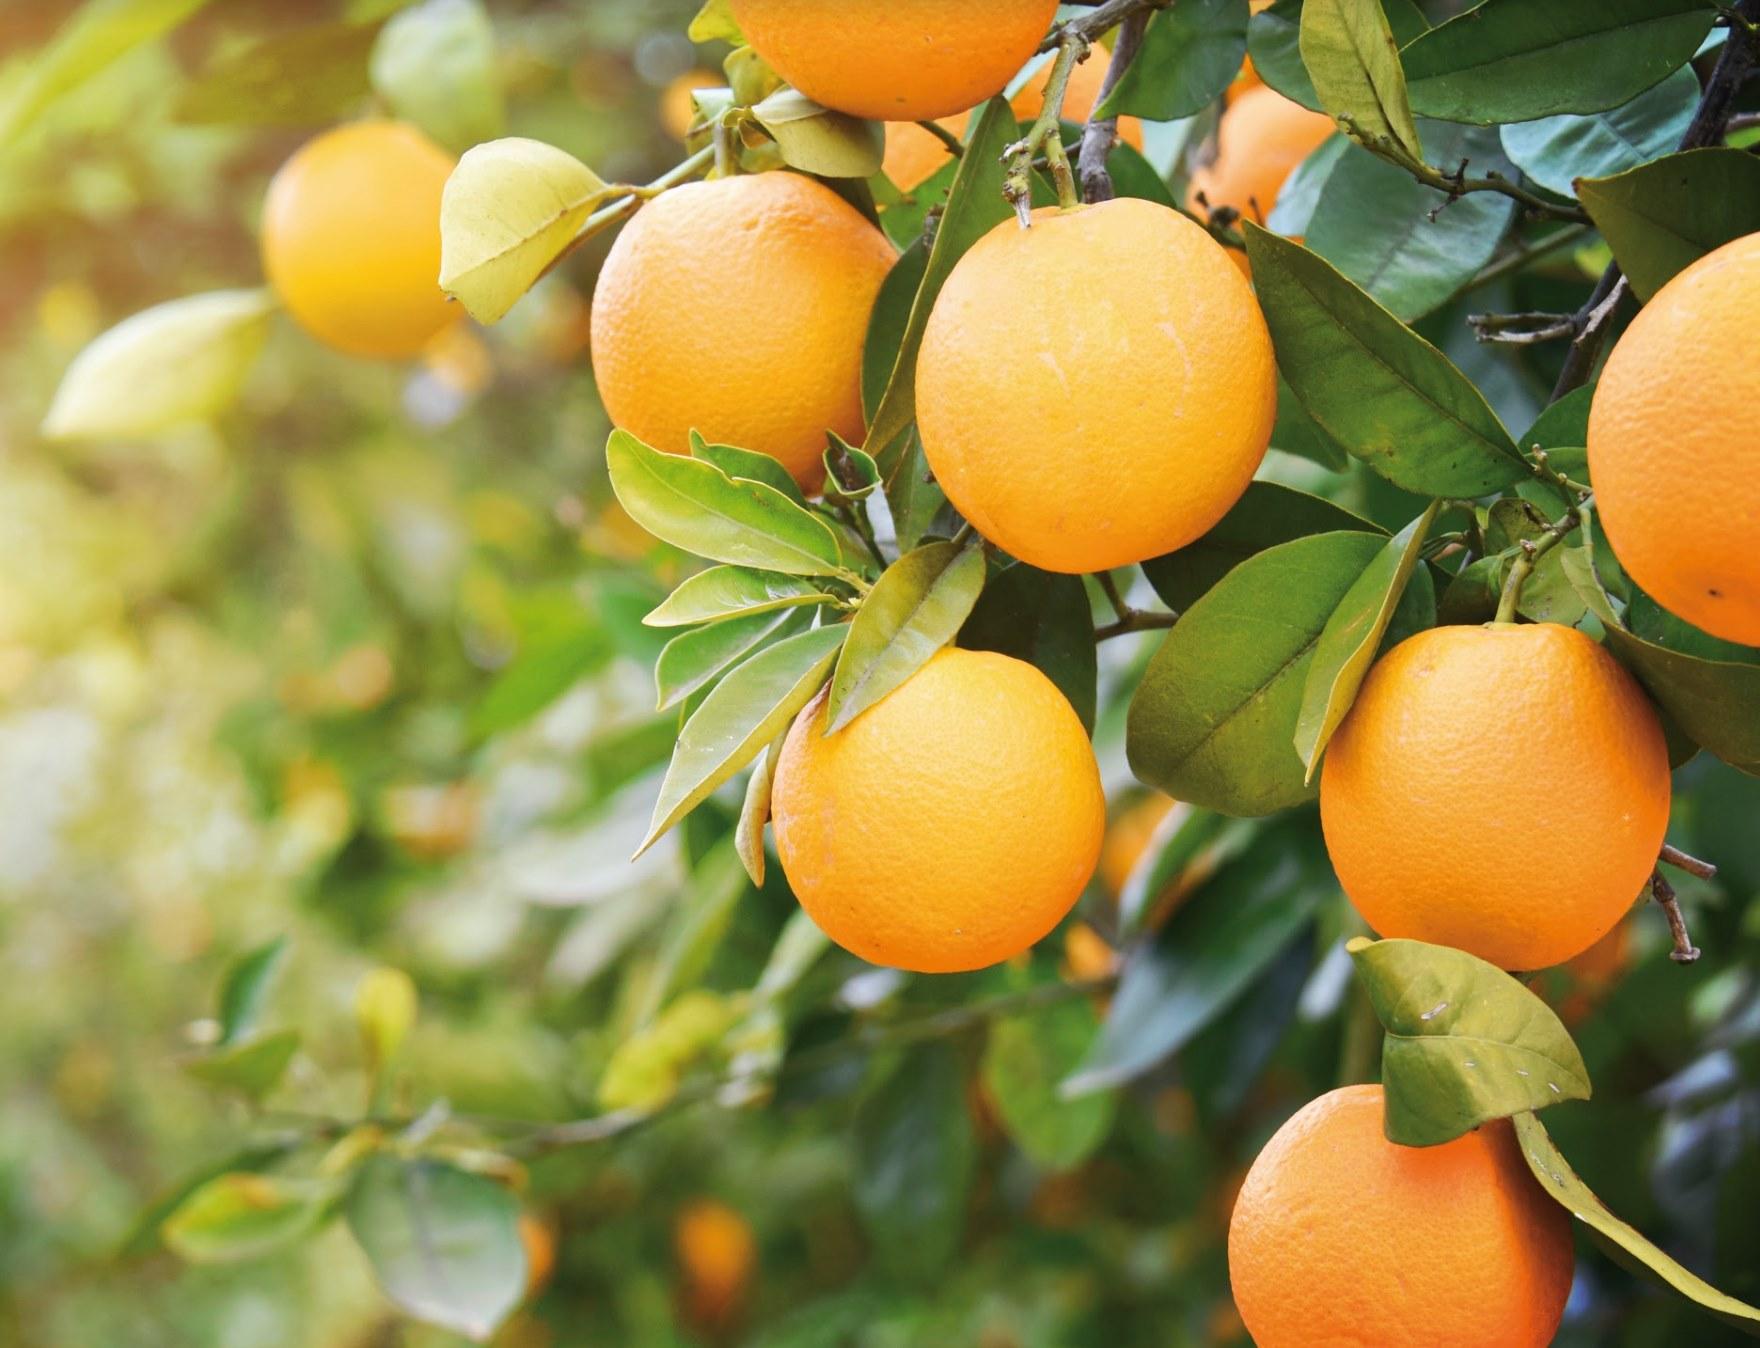 Fertiglobal's aim is to reinforce and nurture crops for their best development